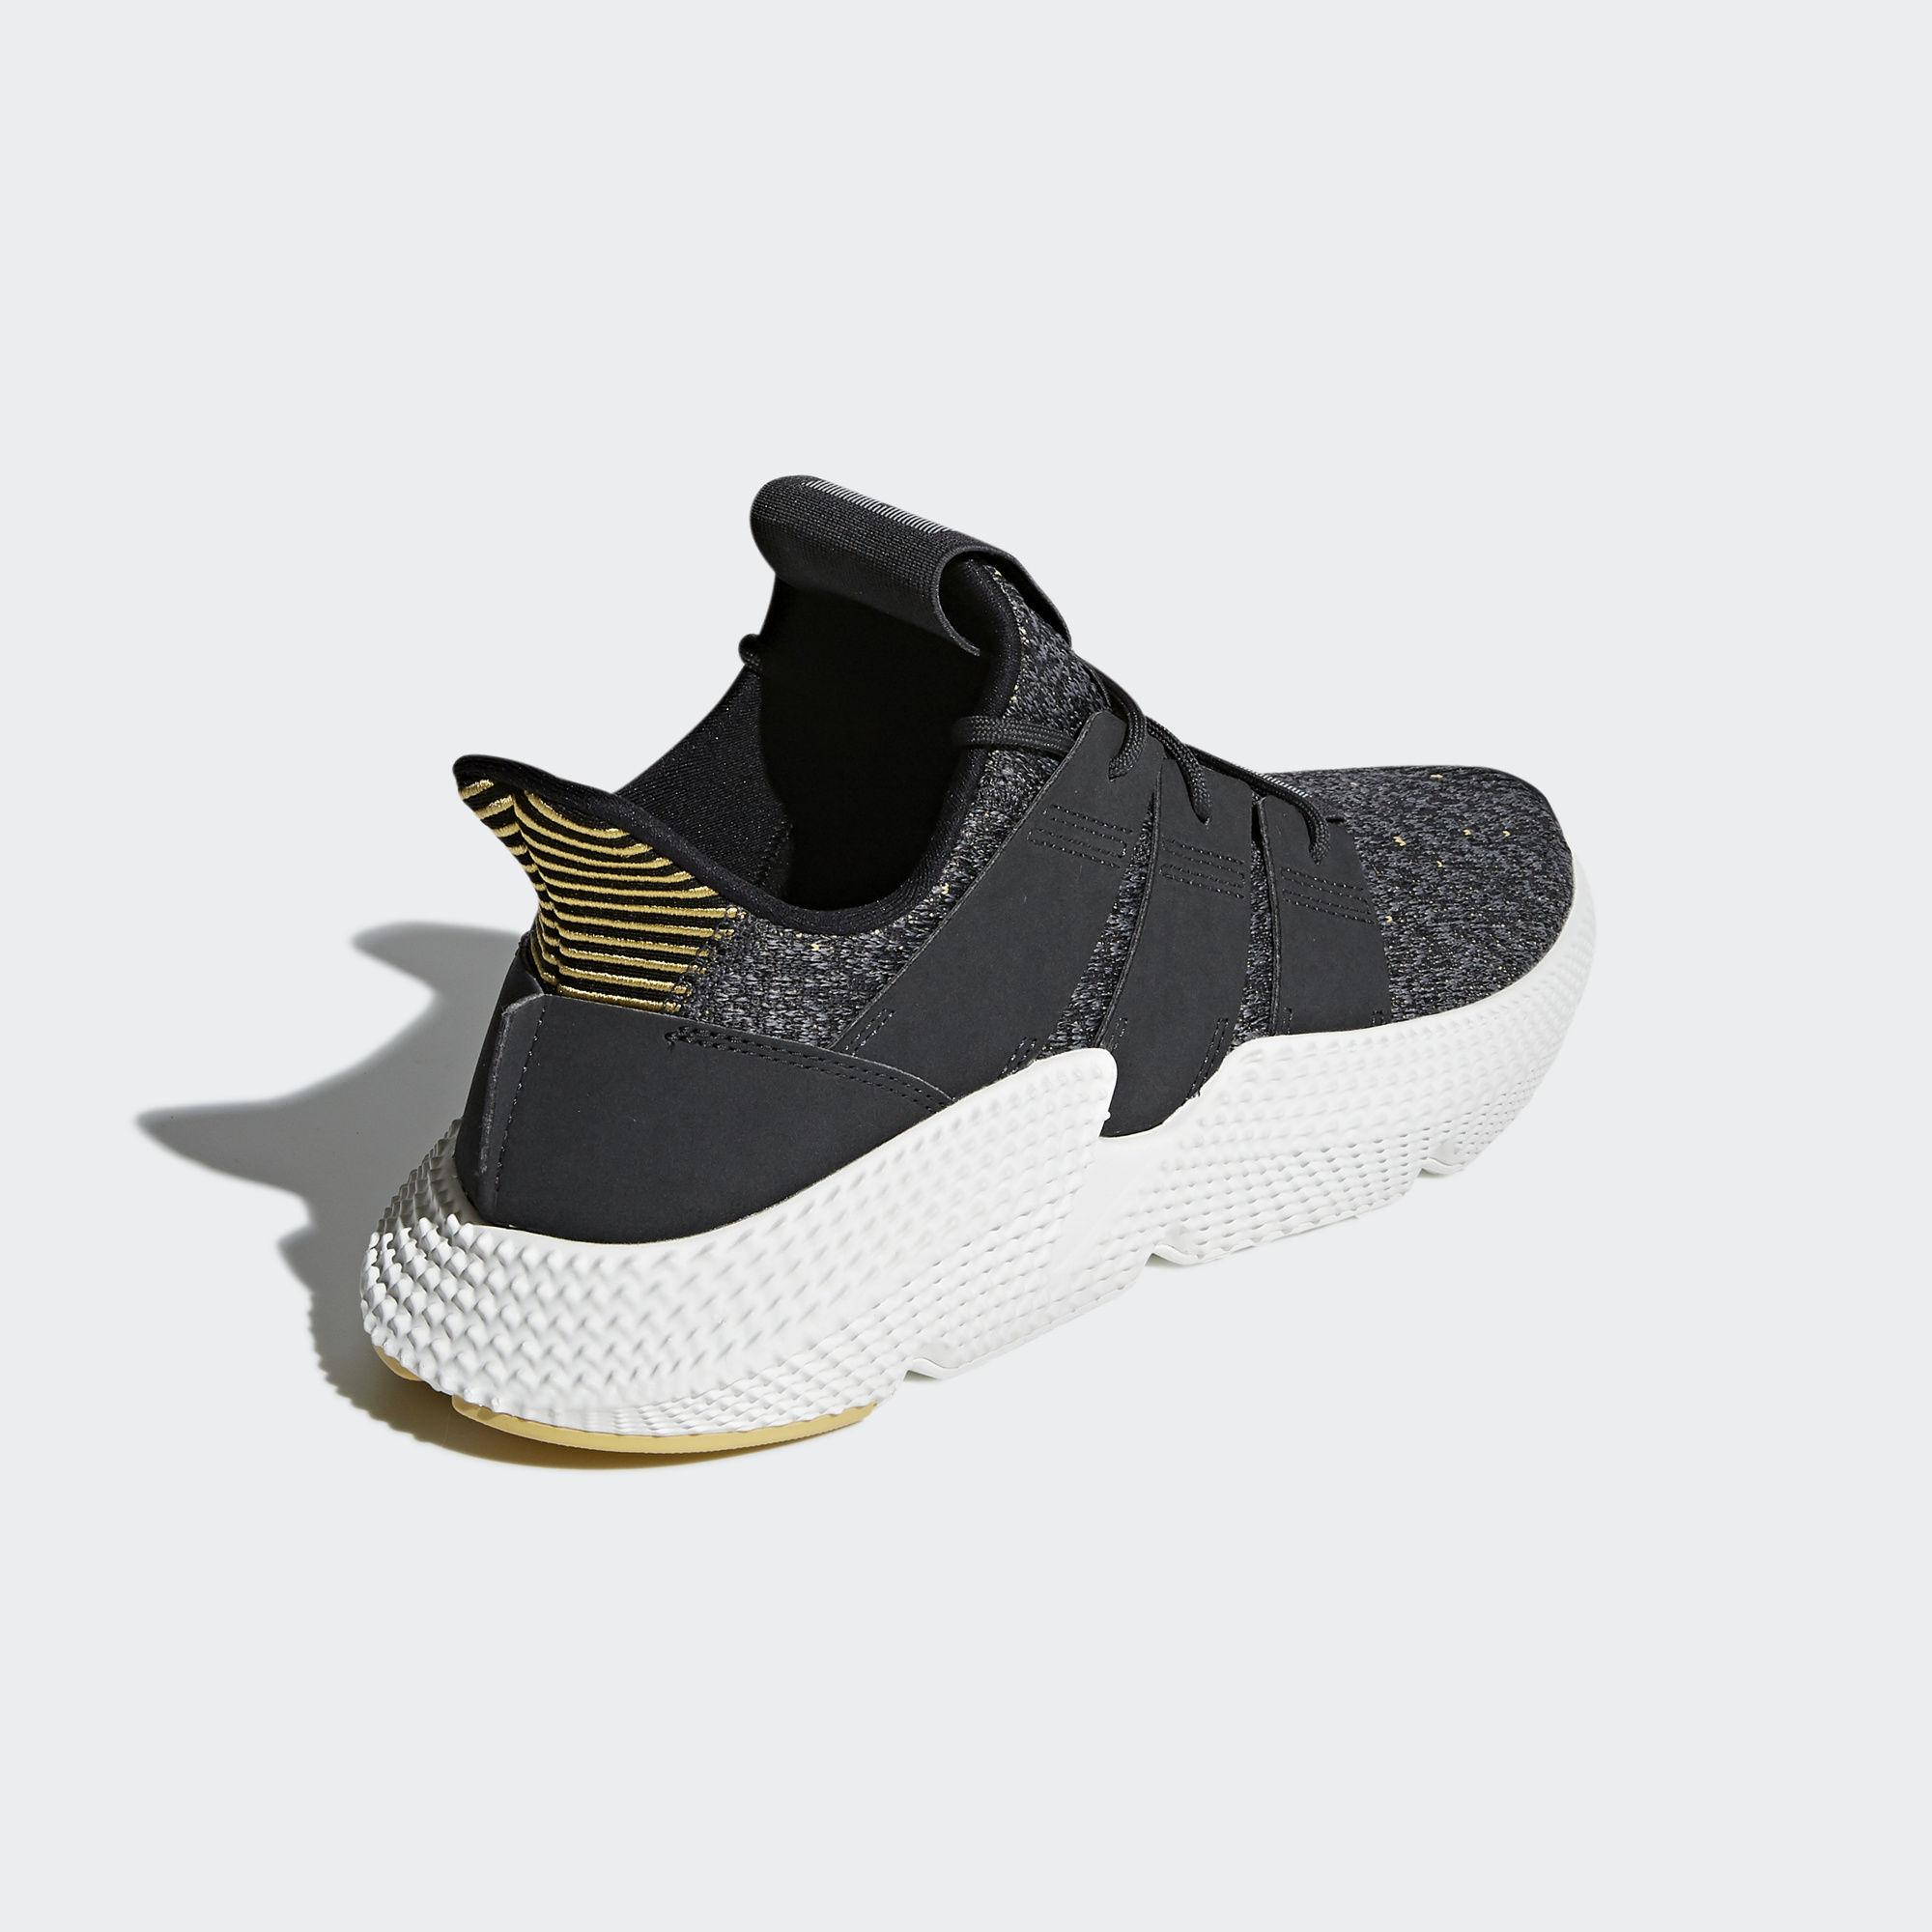 Prophere B37073 Adidas Originals